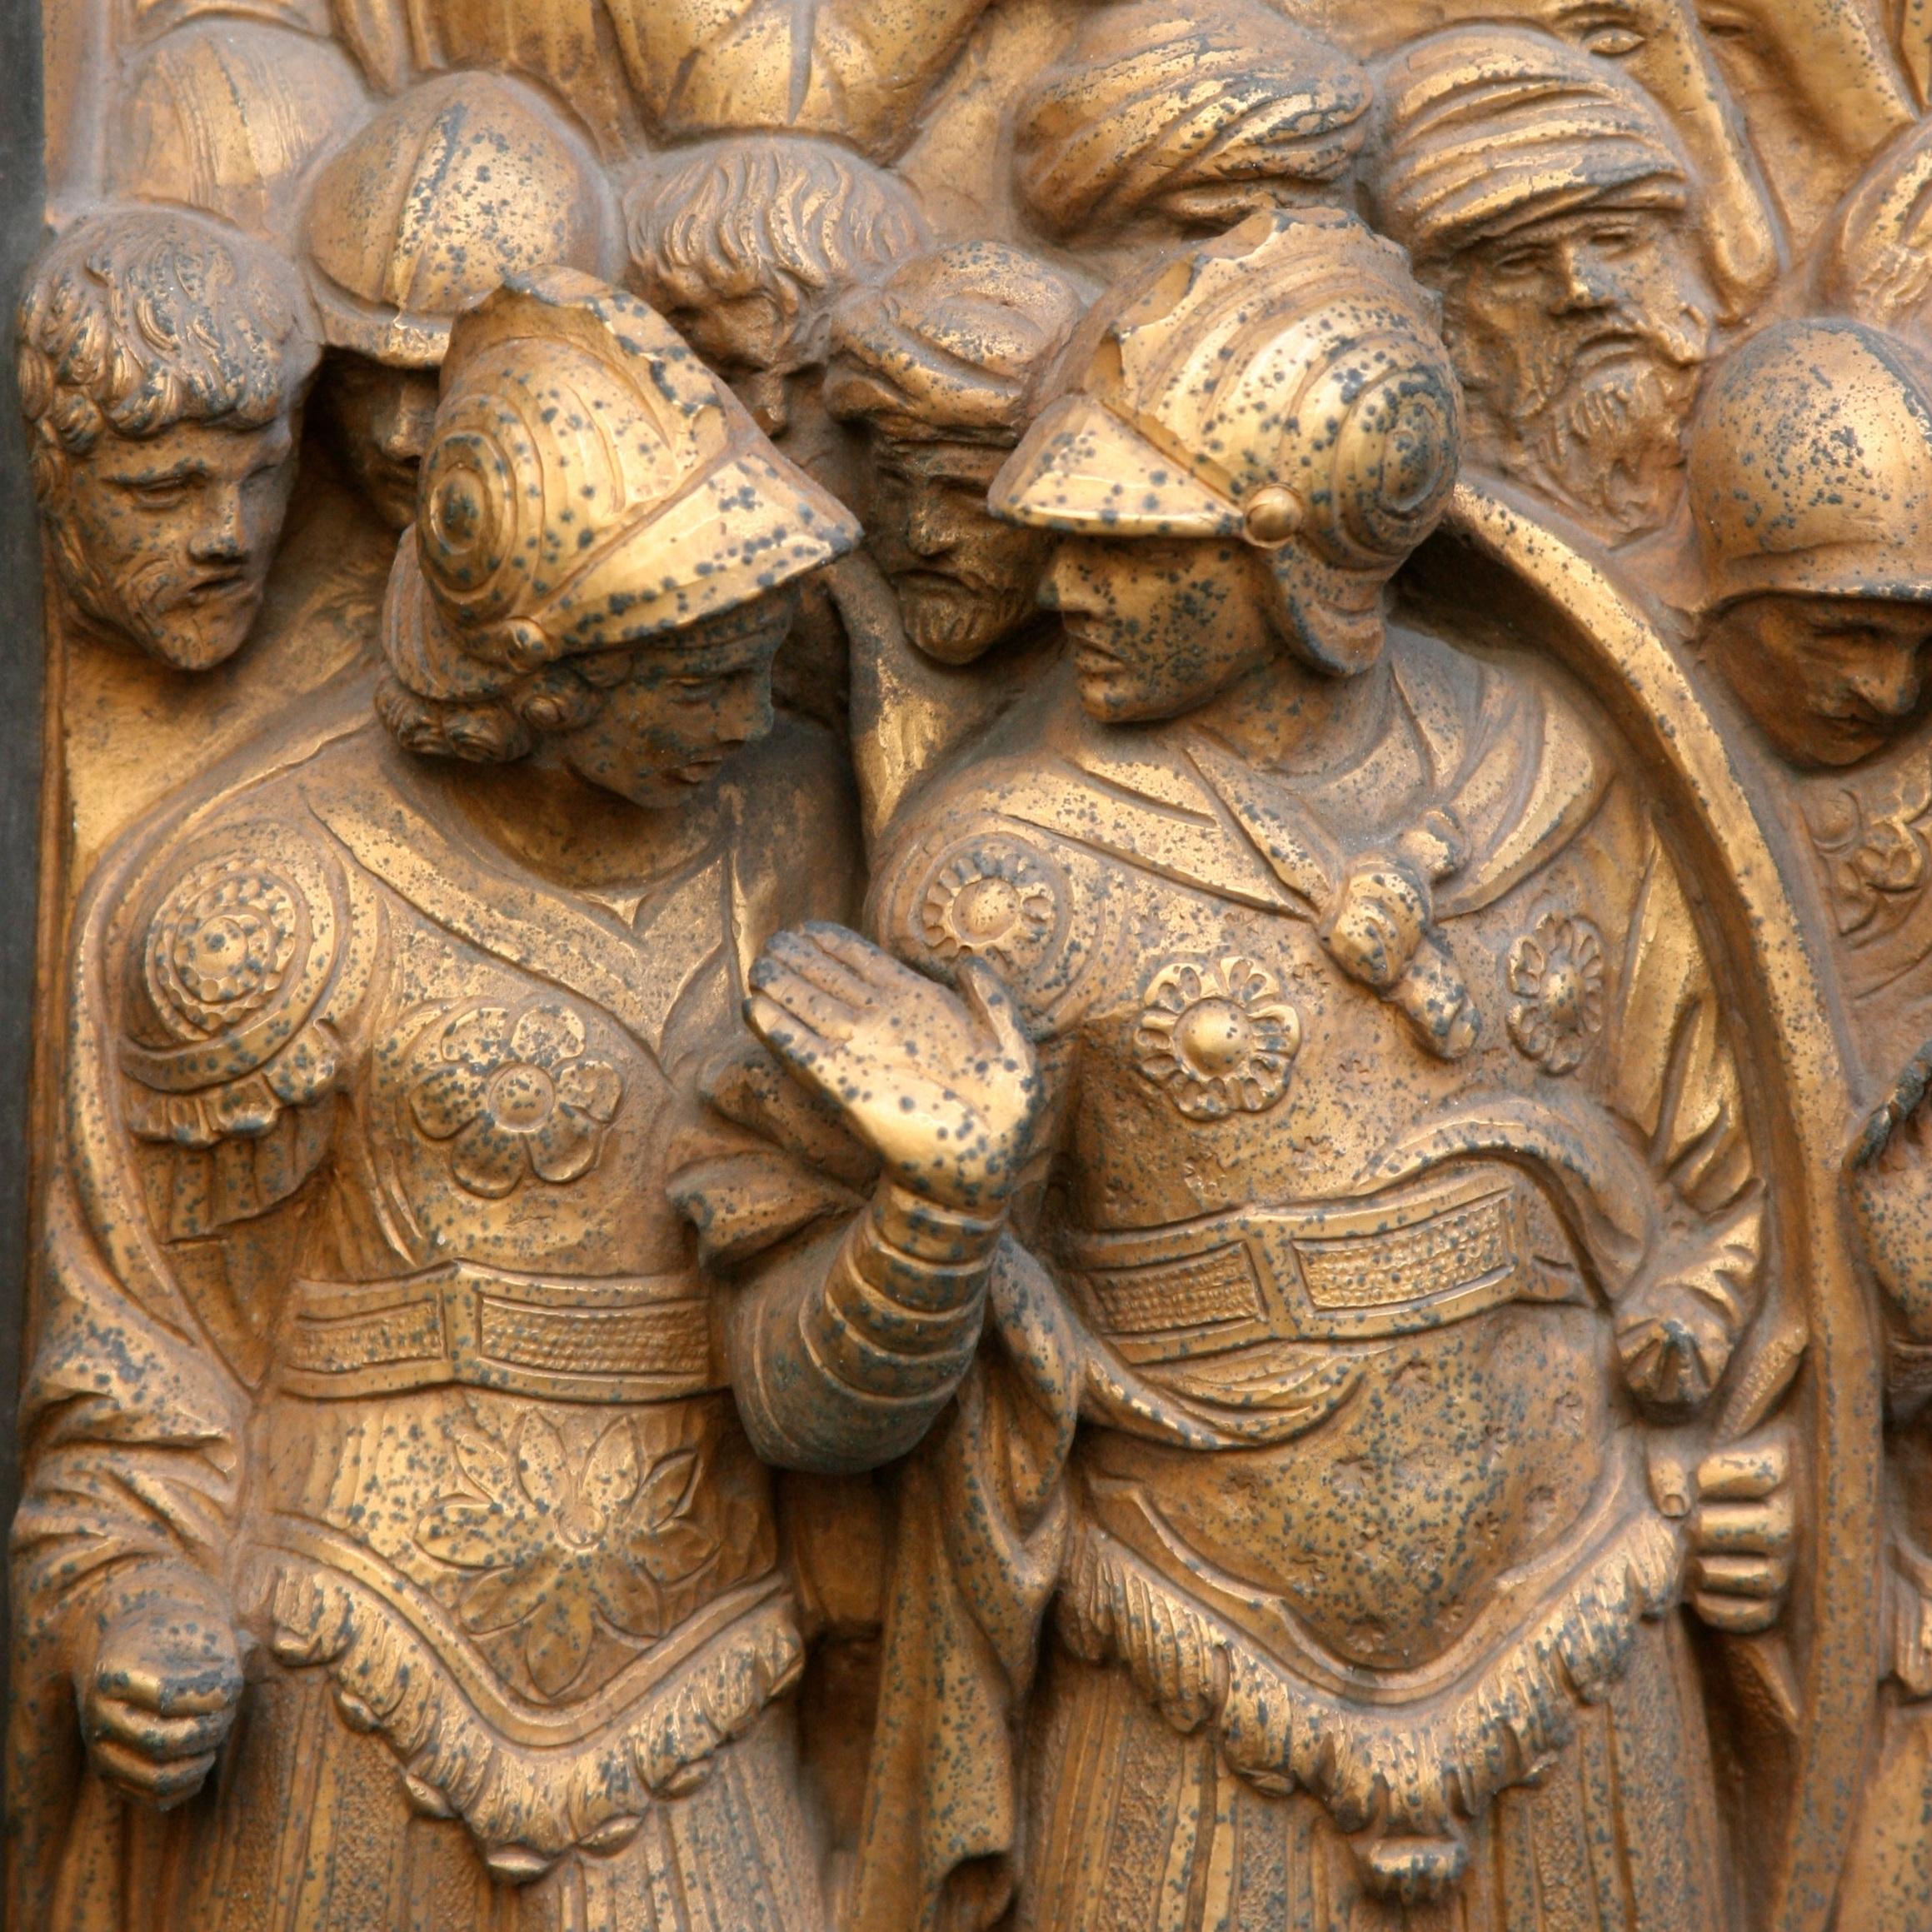 Frieze from Ghiberti's baptistry doors